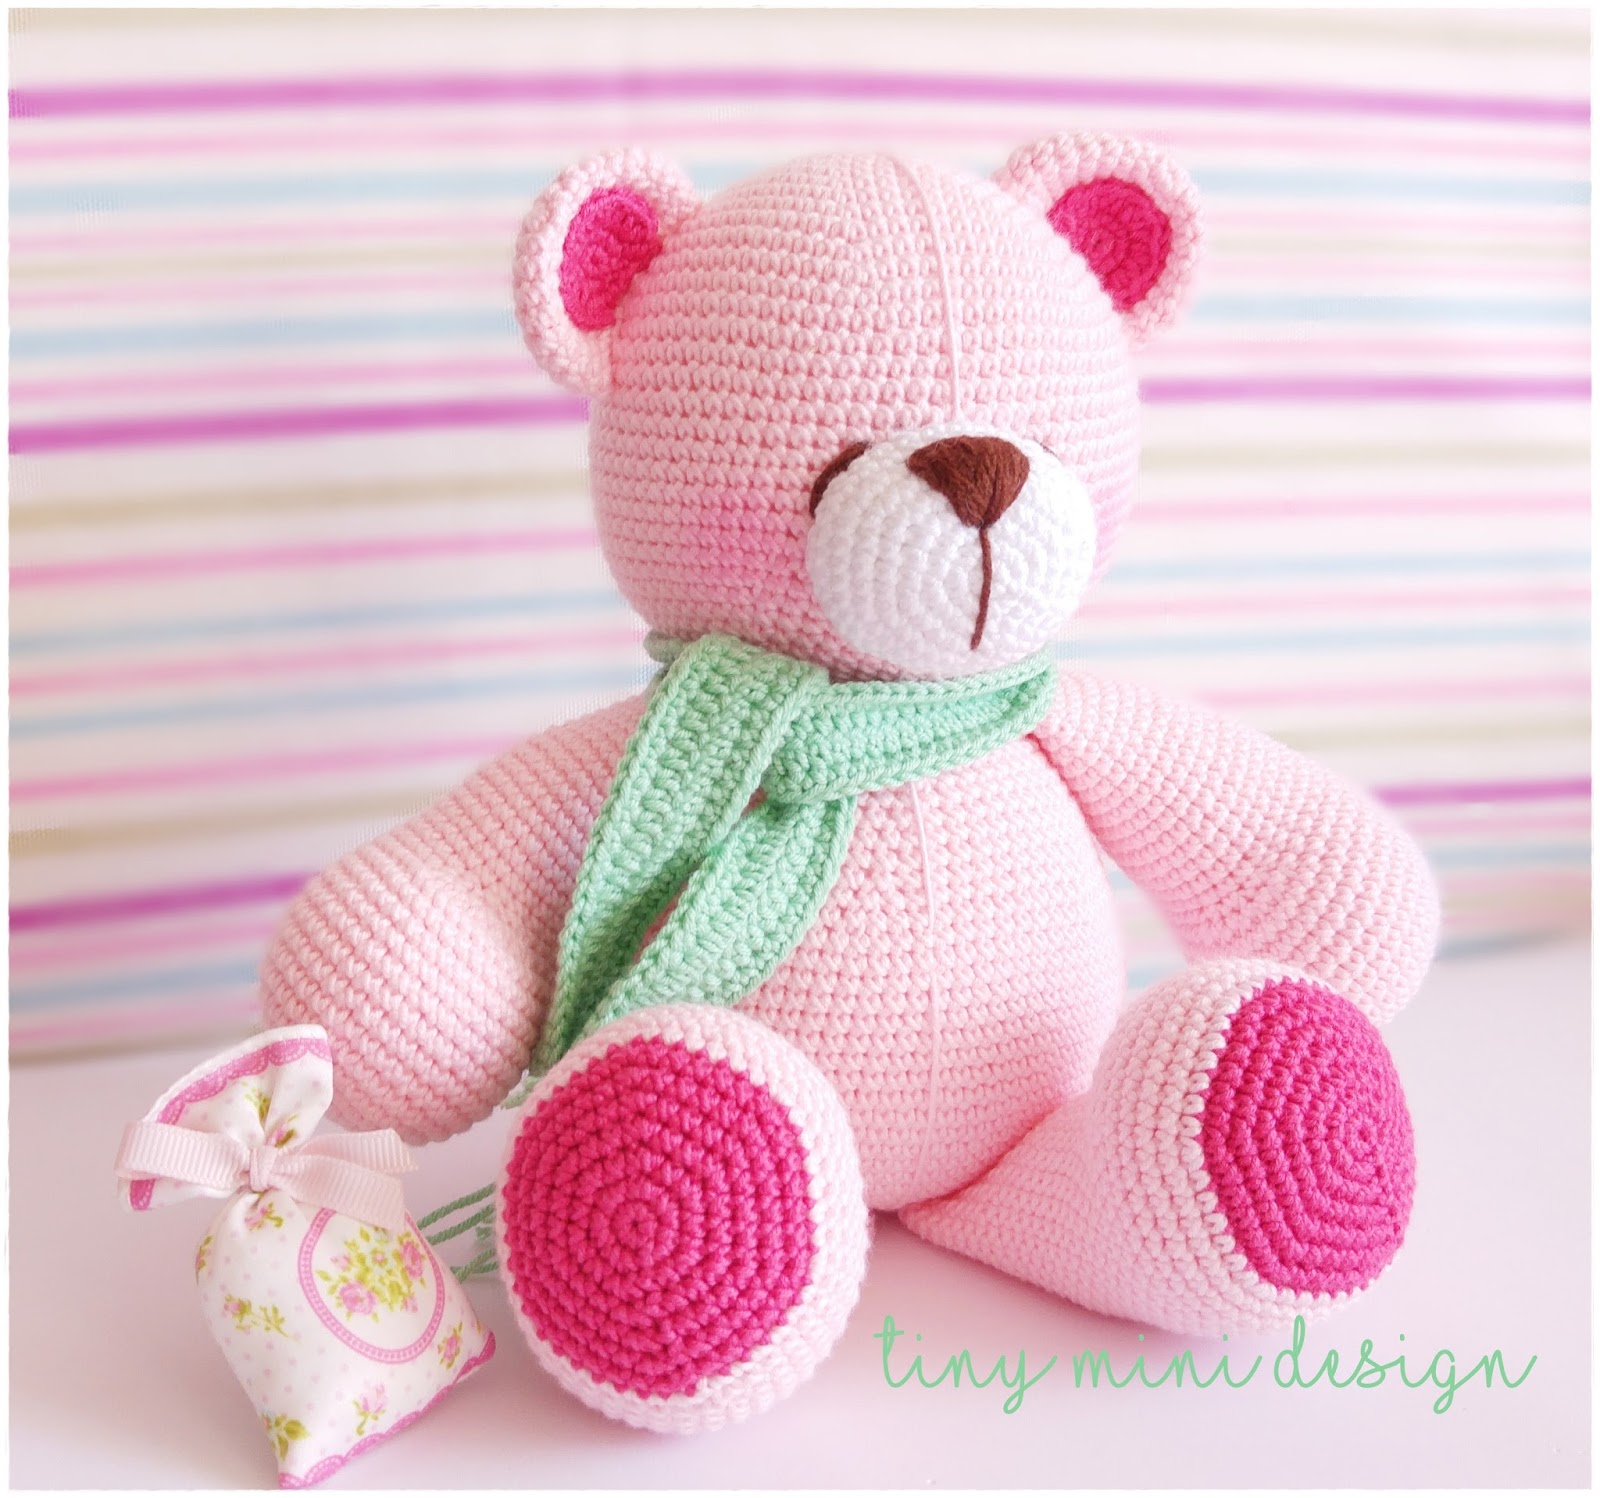 Amigurumi Pink Bear : Amigurumi Pink Bear - Knitting, Crochet, Diy, Craft, Free ...